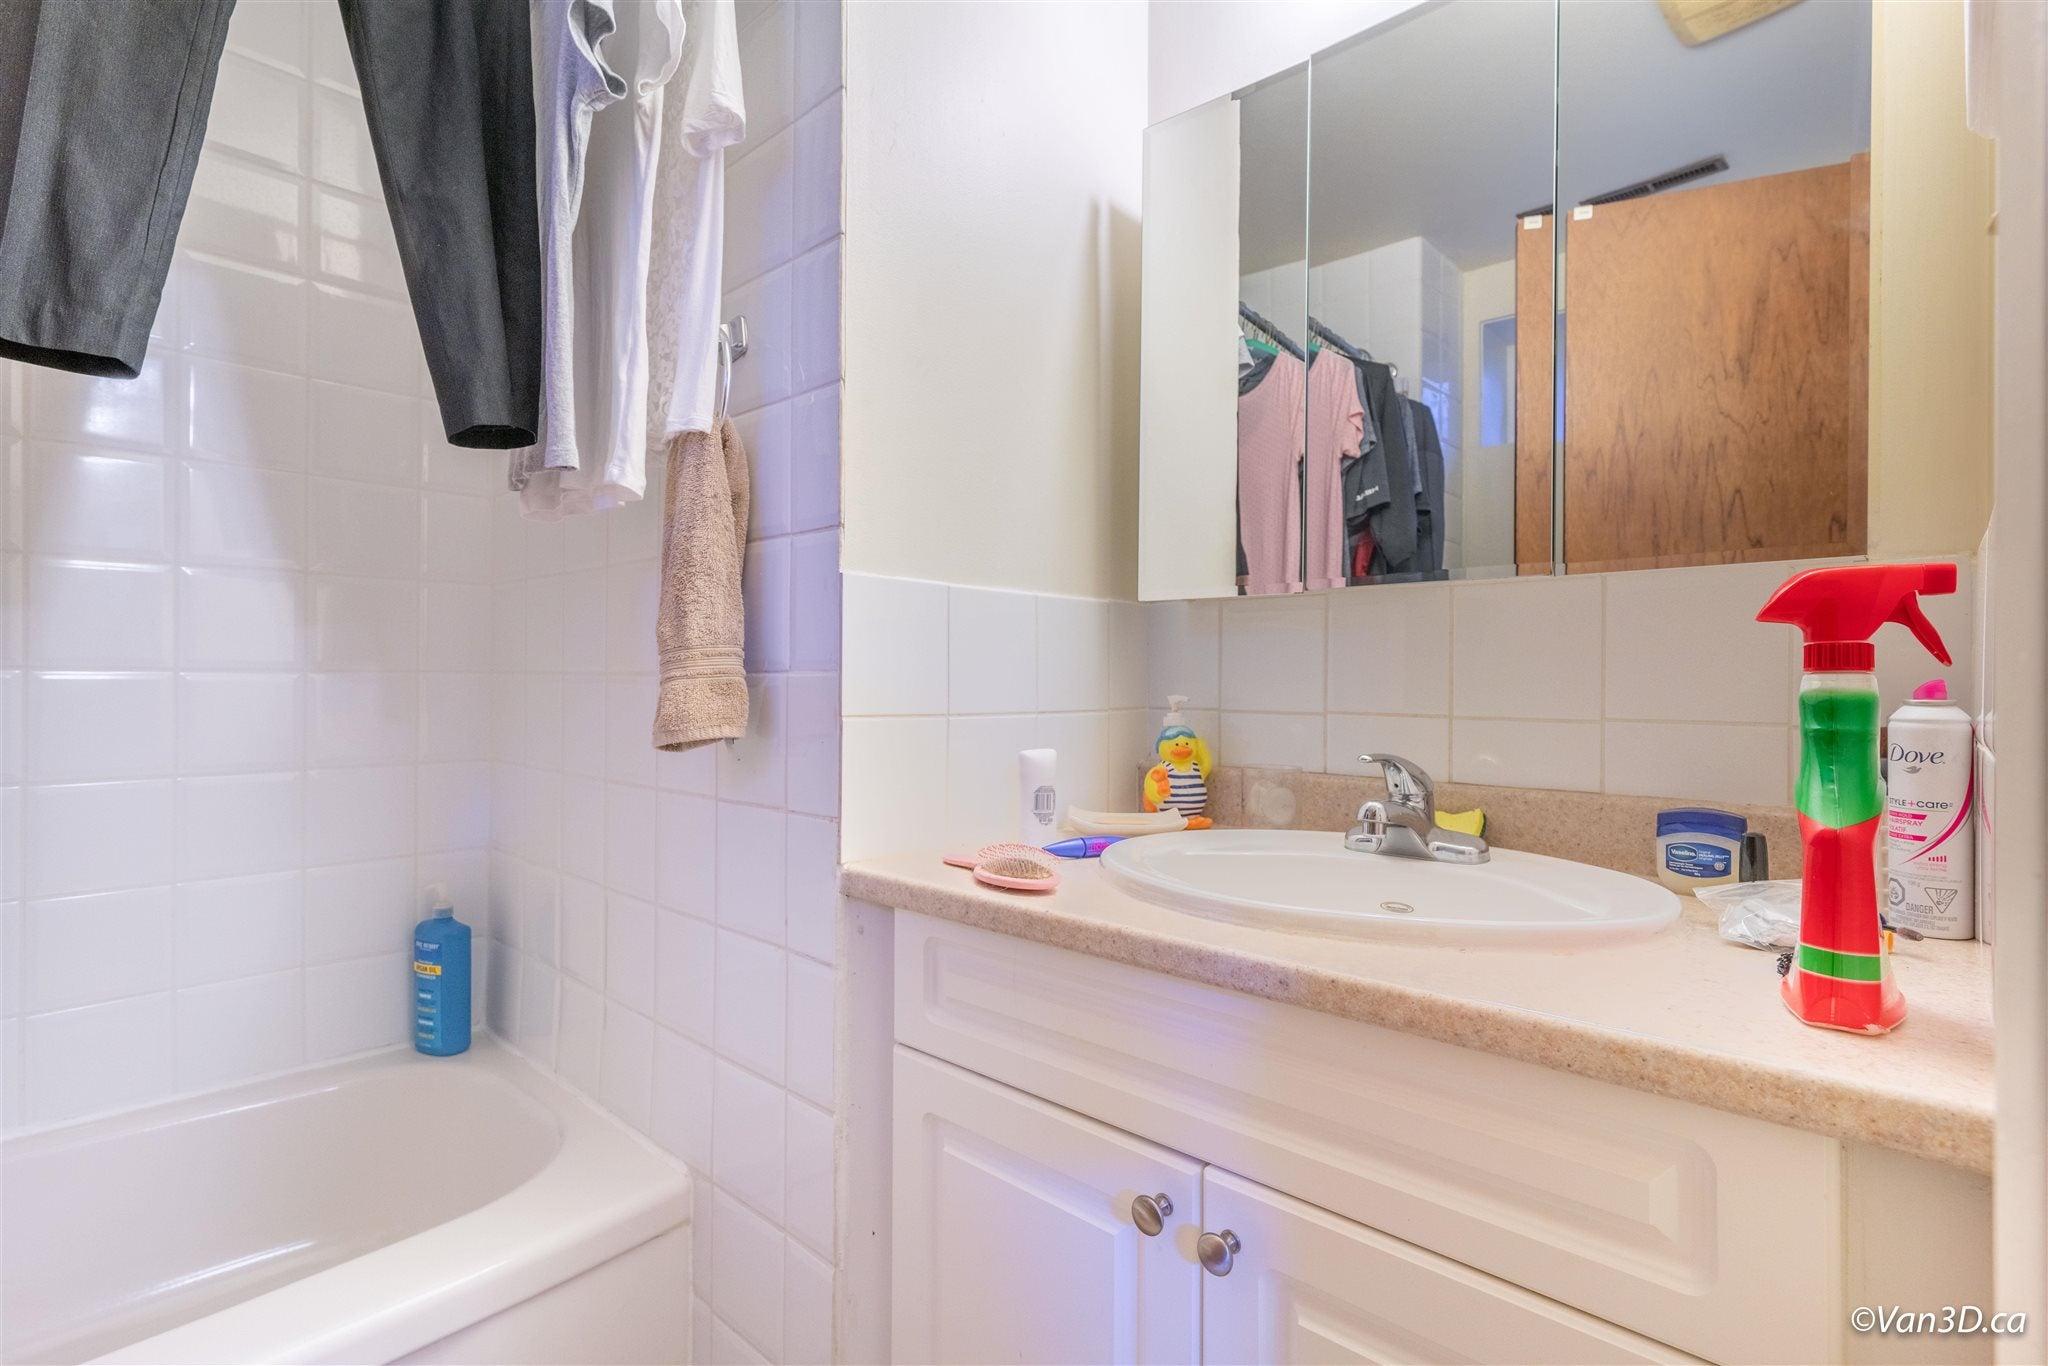 14495 MANN PARK CRESCENT - White Rock House/Single Family for sale, 4 Bedrooms (R2604561) - #33